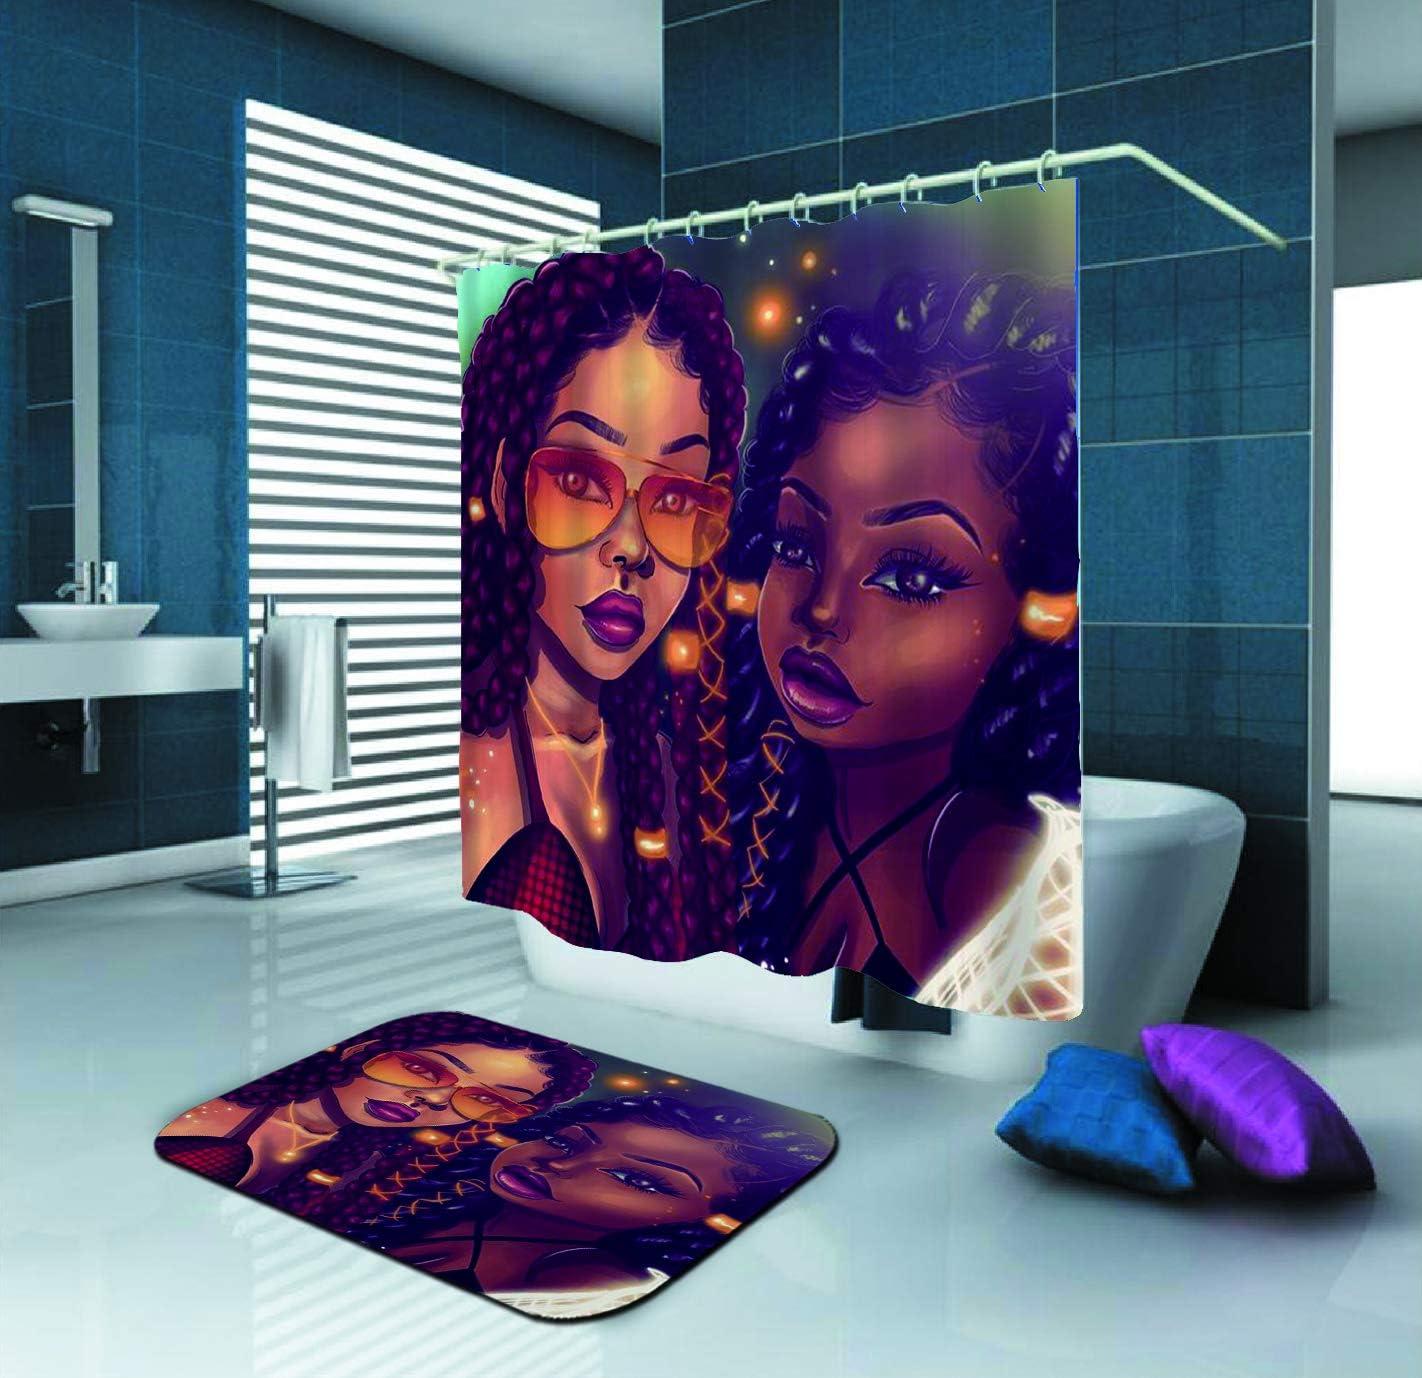 Makeup African girl Shower Curtain Sets Bathroom Waterproof Fabric /& 12 Hooks